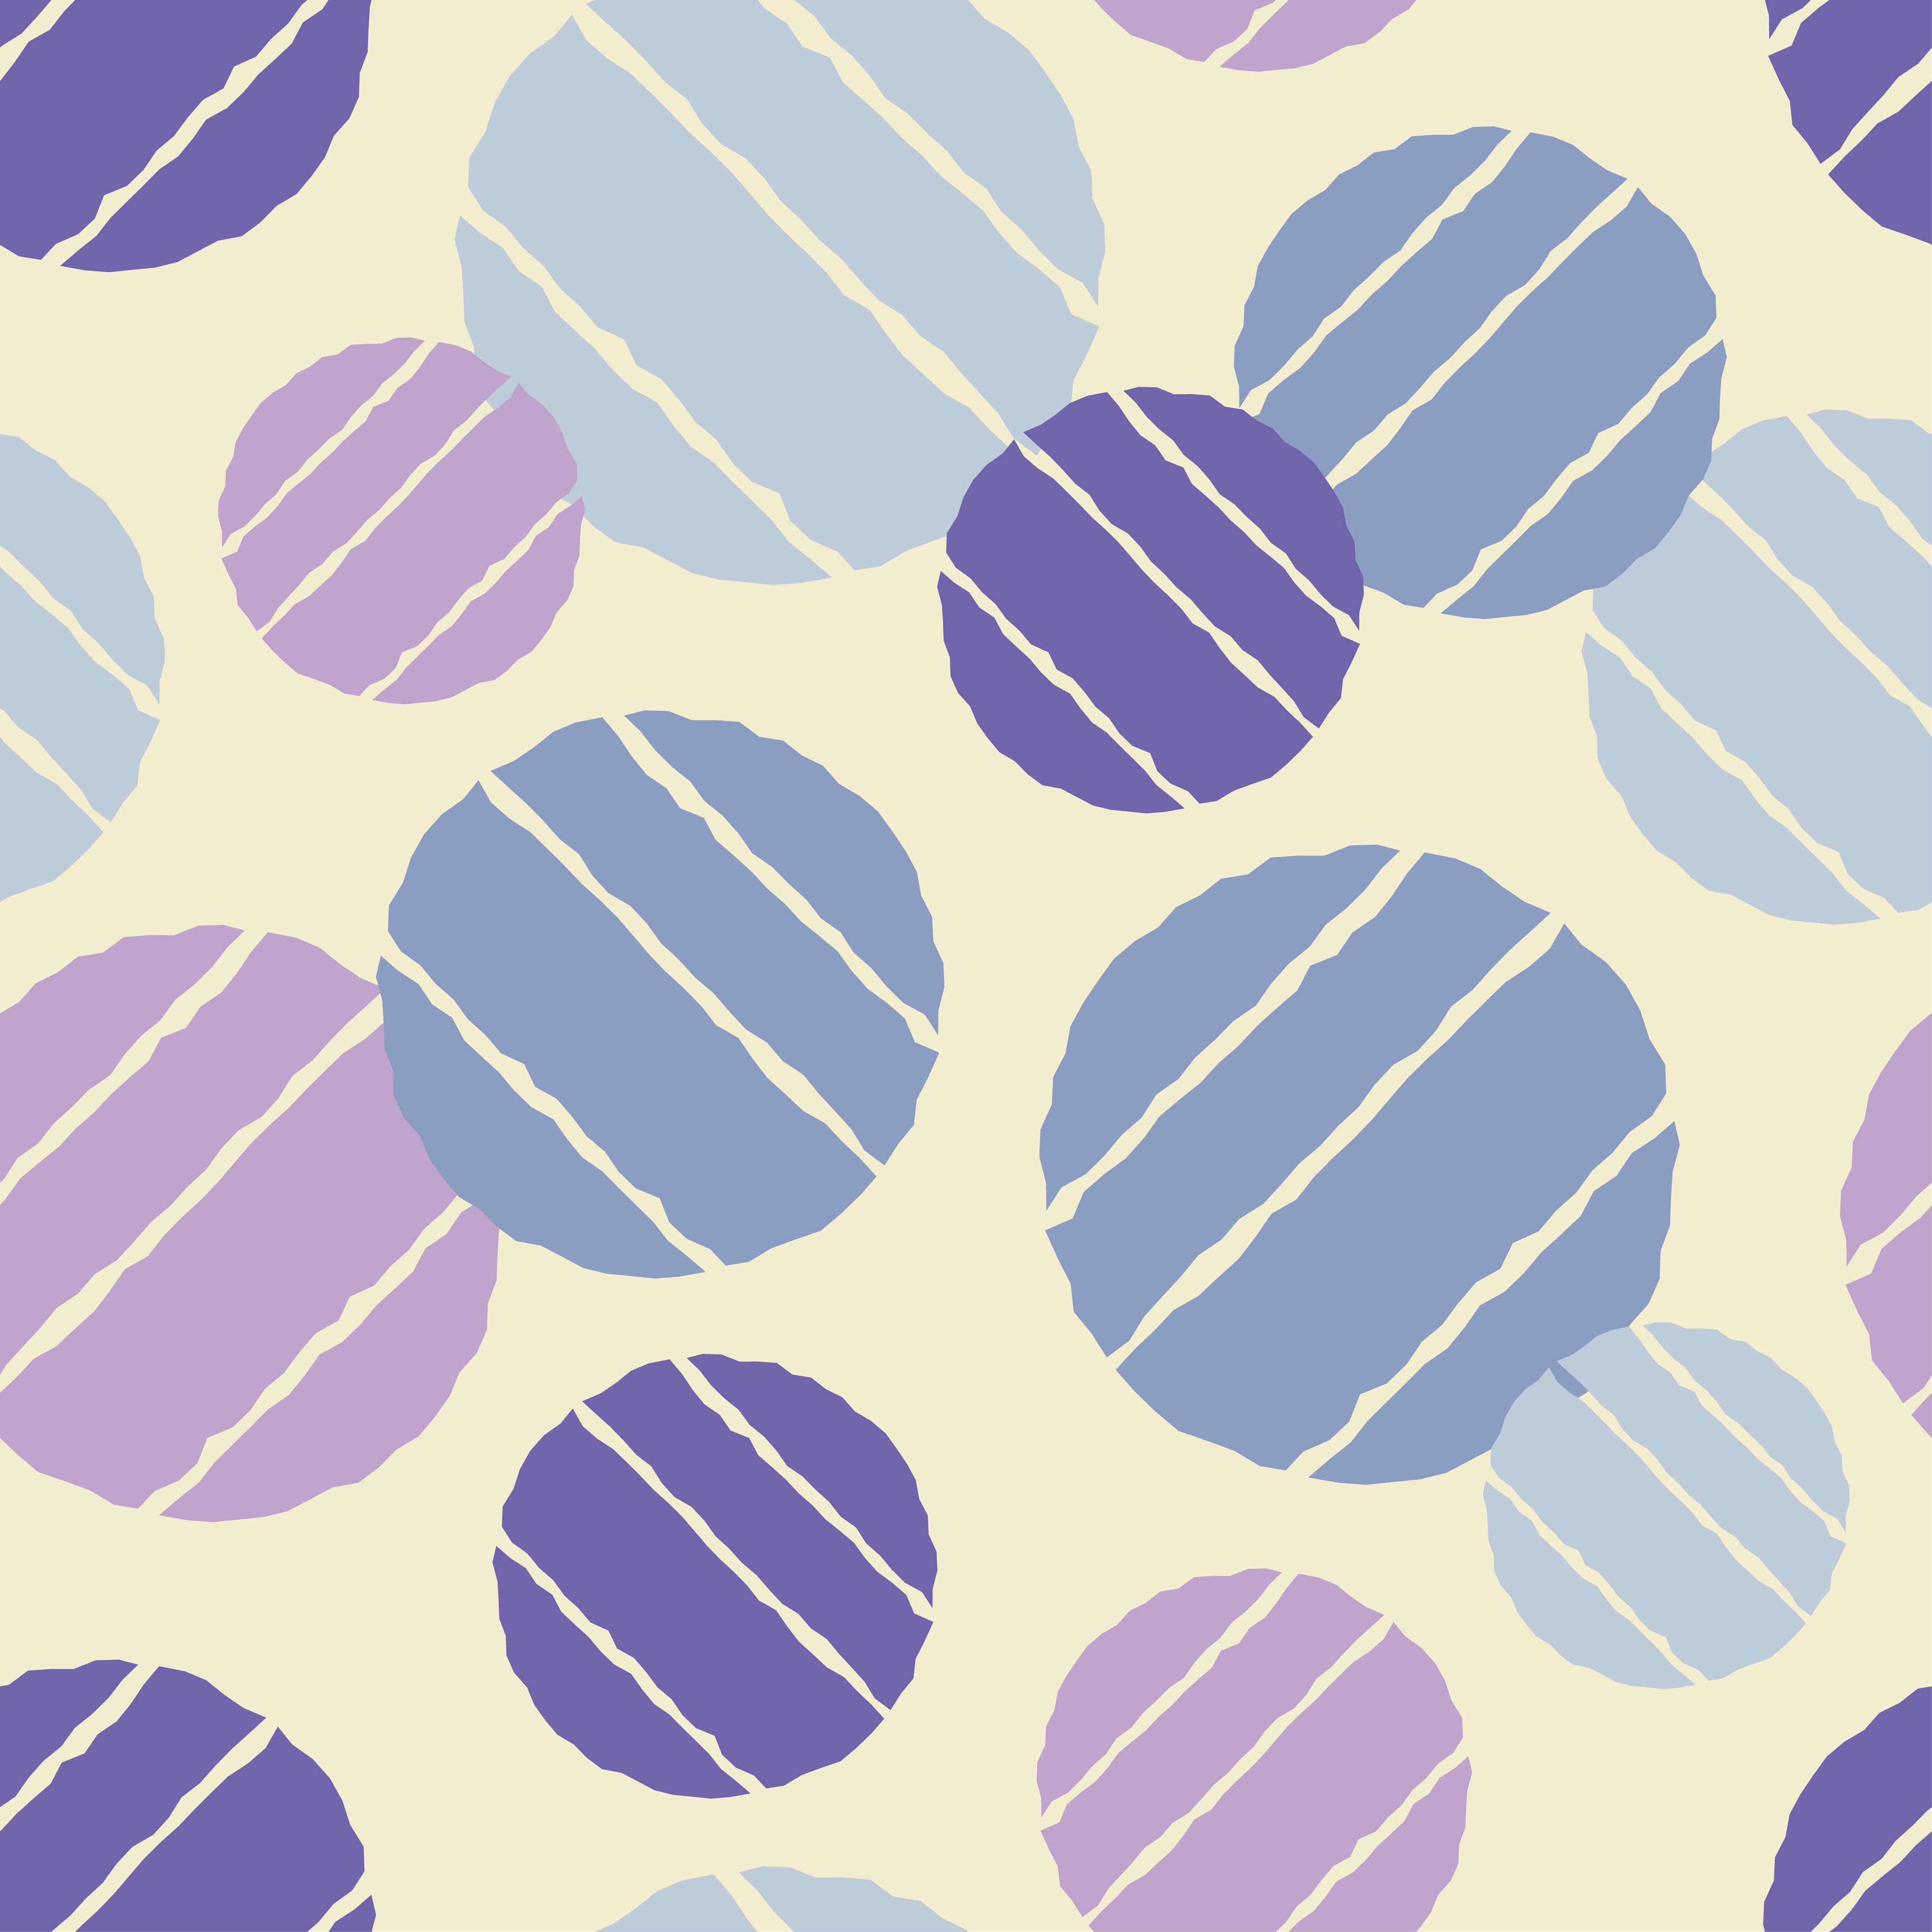 Polka dot seamless pattern. Sketch texture.  example image 5